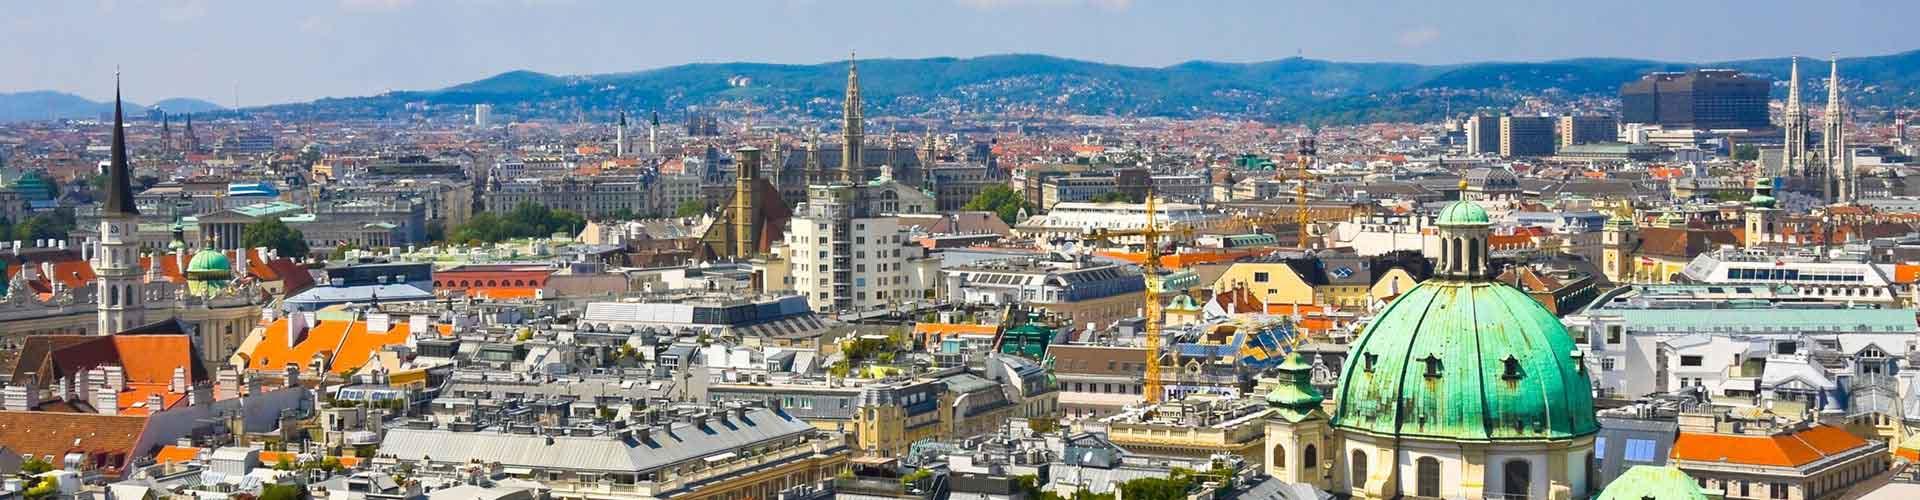 Vienna – Hostels in Vienna. Maps for Vienna, Photos and Reviews for each hostel in Vienna.